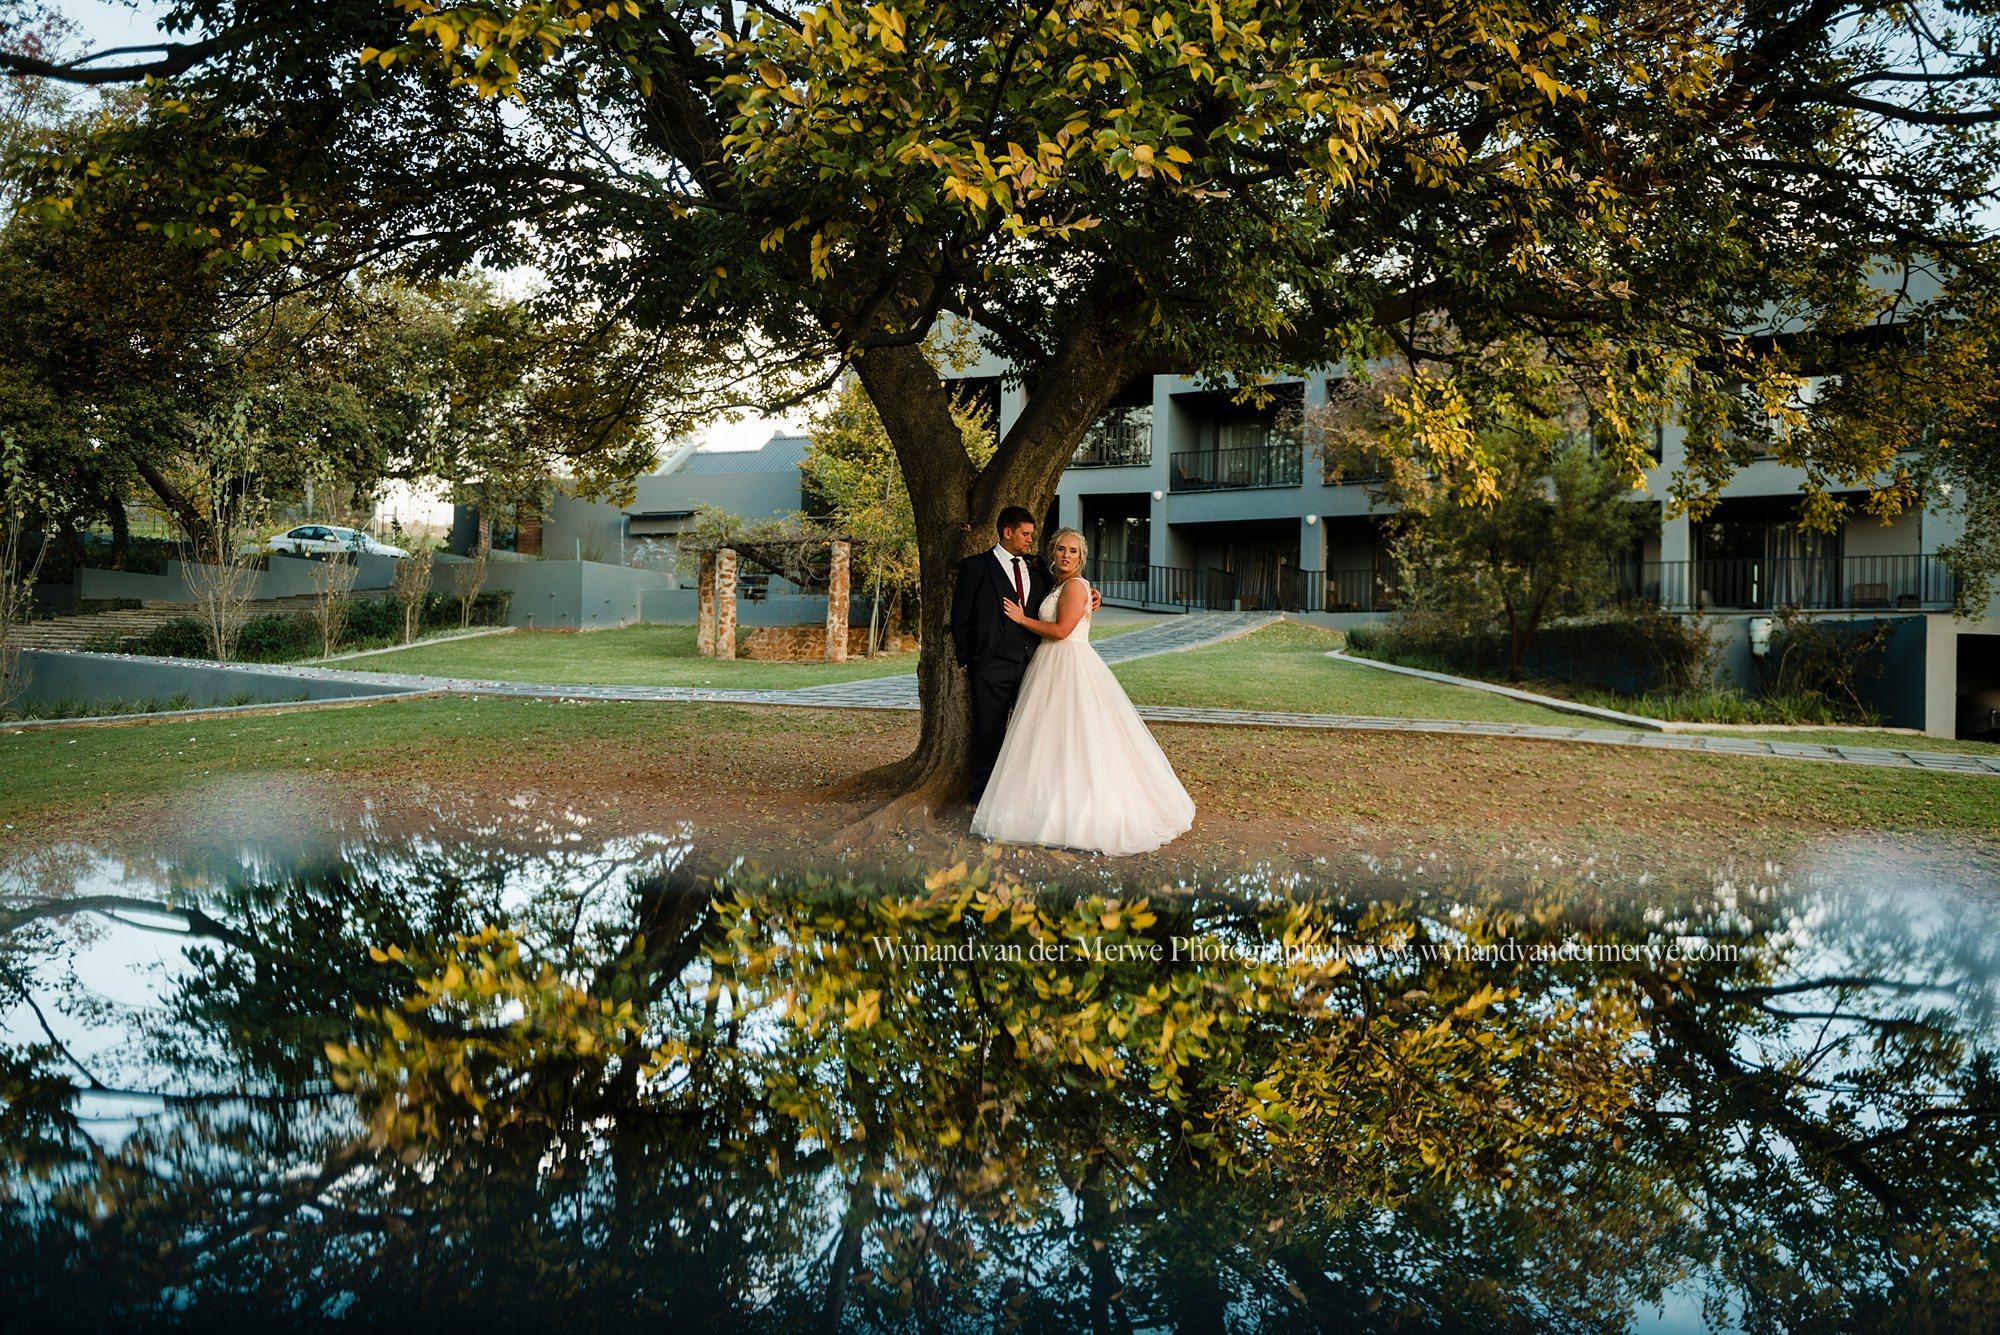 Wynandvandermerwe marcel zandrie wedding goregous inimitable wedding venue gauteng-28.jpg